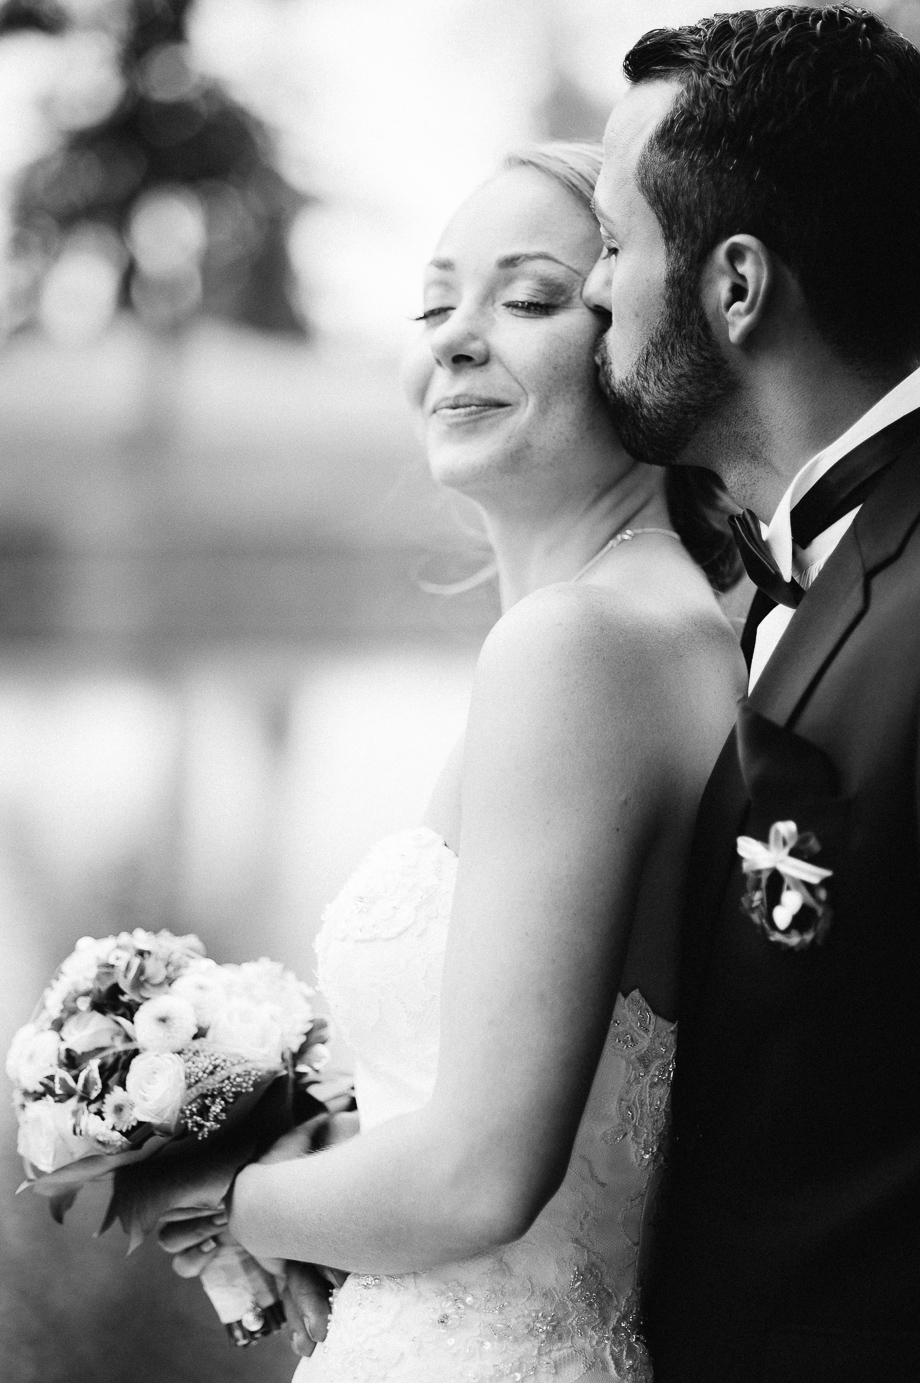 Hochzeit_Kolbermoor_Alte_Spinnerei_Modern_Brautpaar_Multikulturell_Laura_Elena_Photography_064